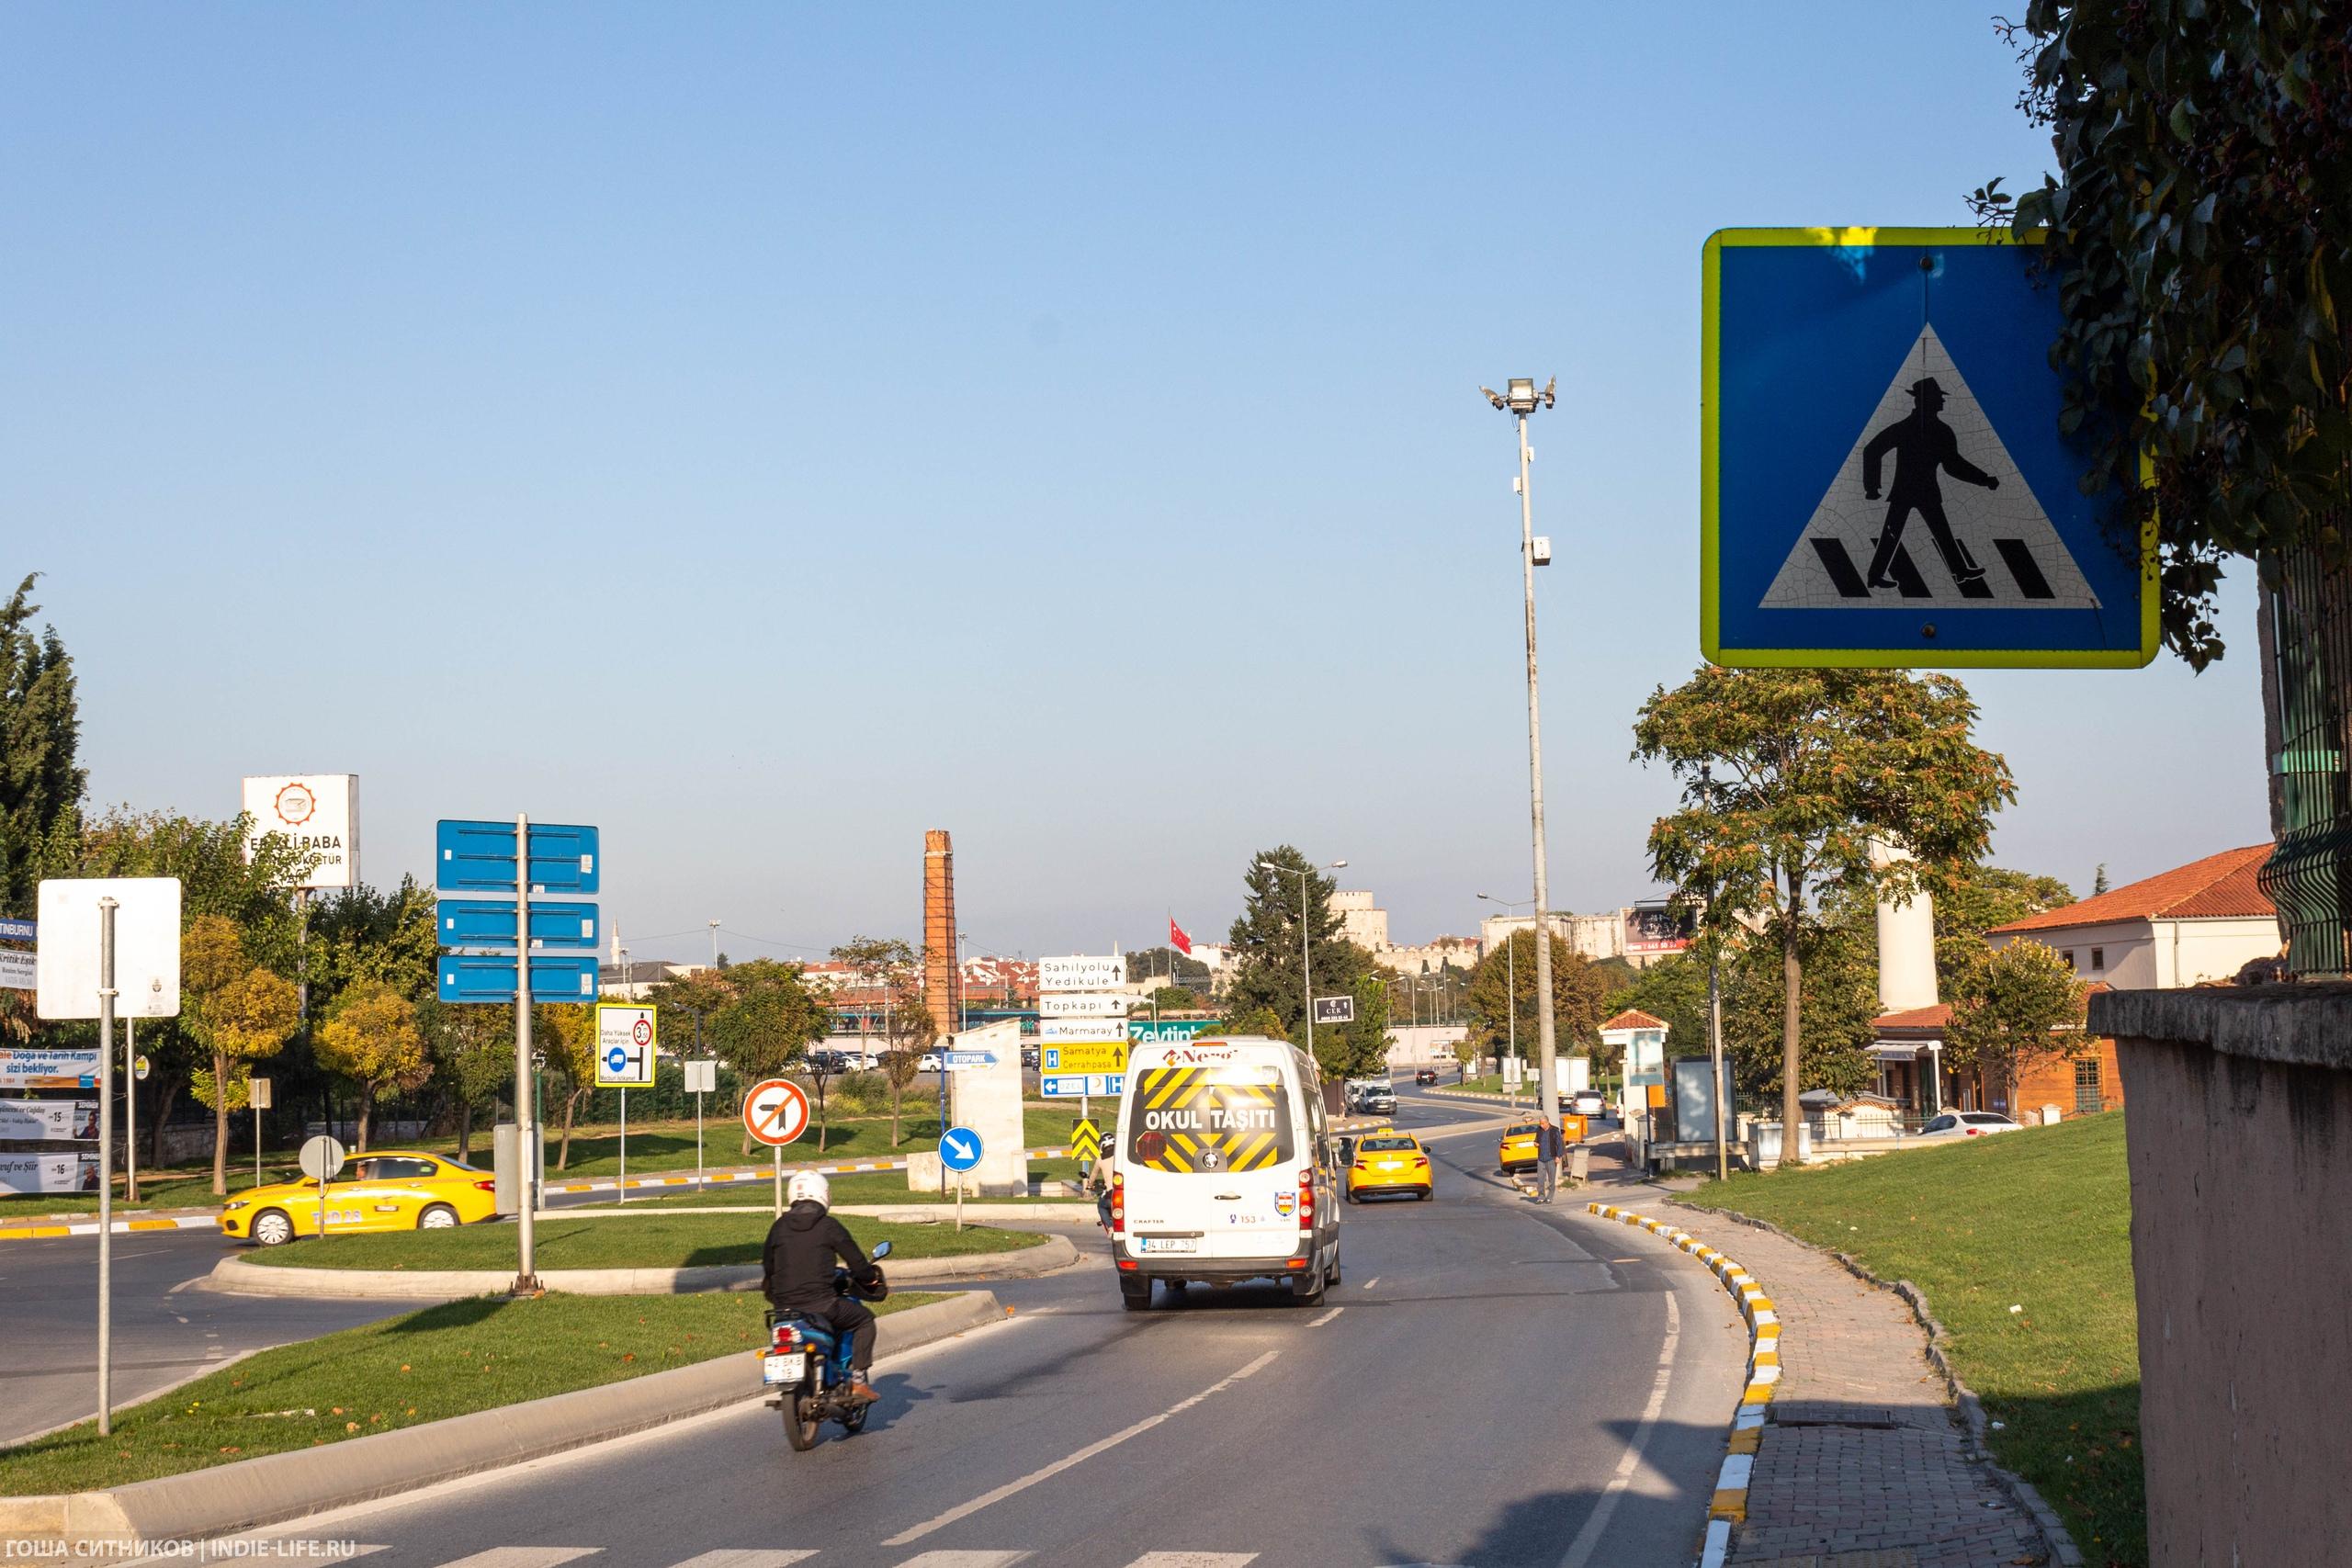 Турецкий знак пешеходного перехода